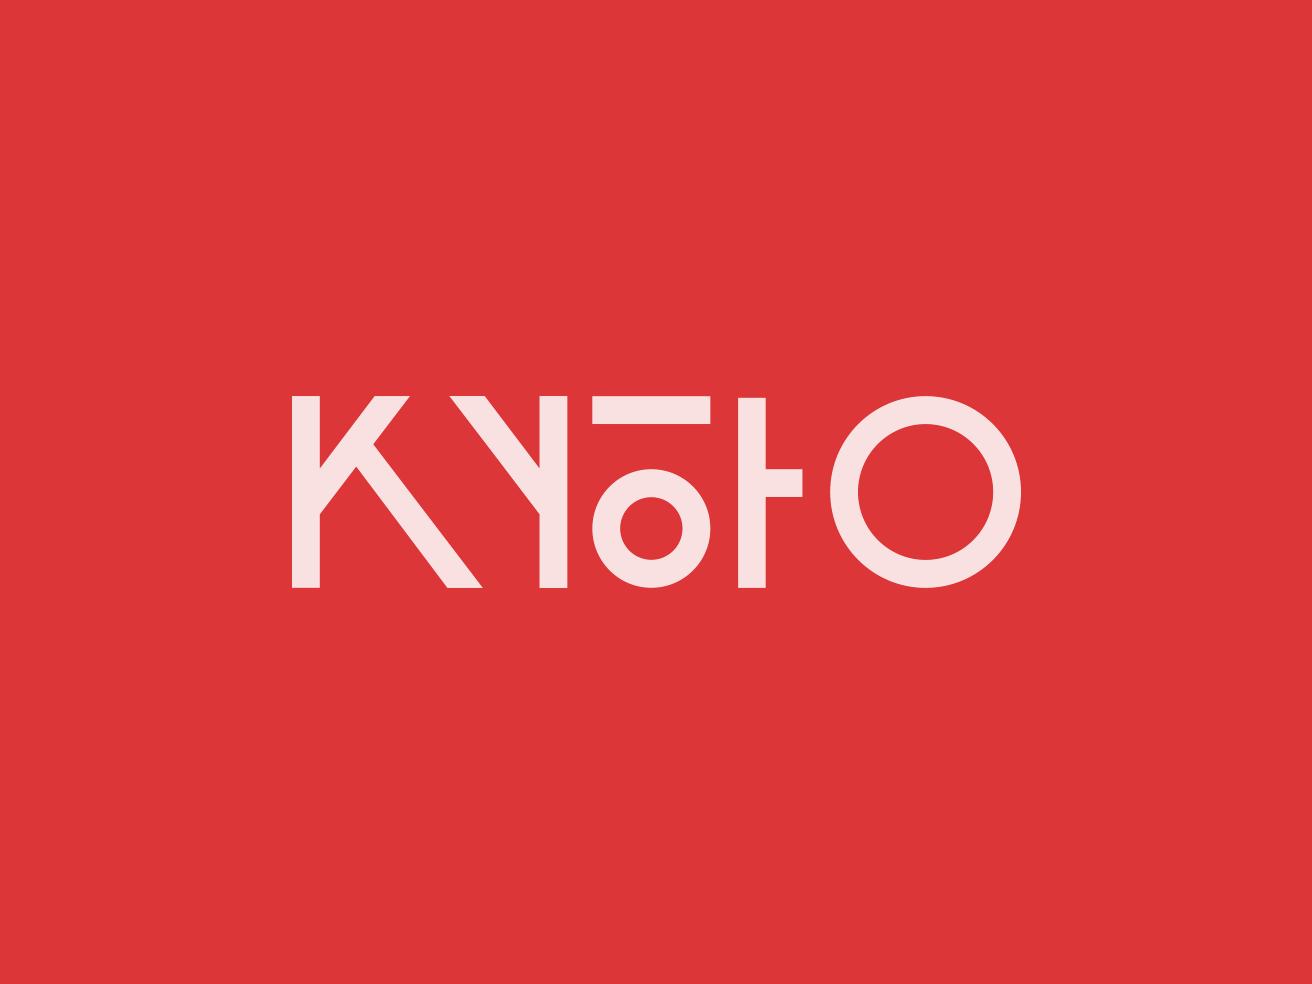 'Kyoto' Logo in Hikari Typeface design branding and identity mockup branding font red typography retro geometric typeface logo japan kyoto